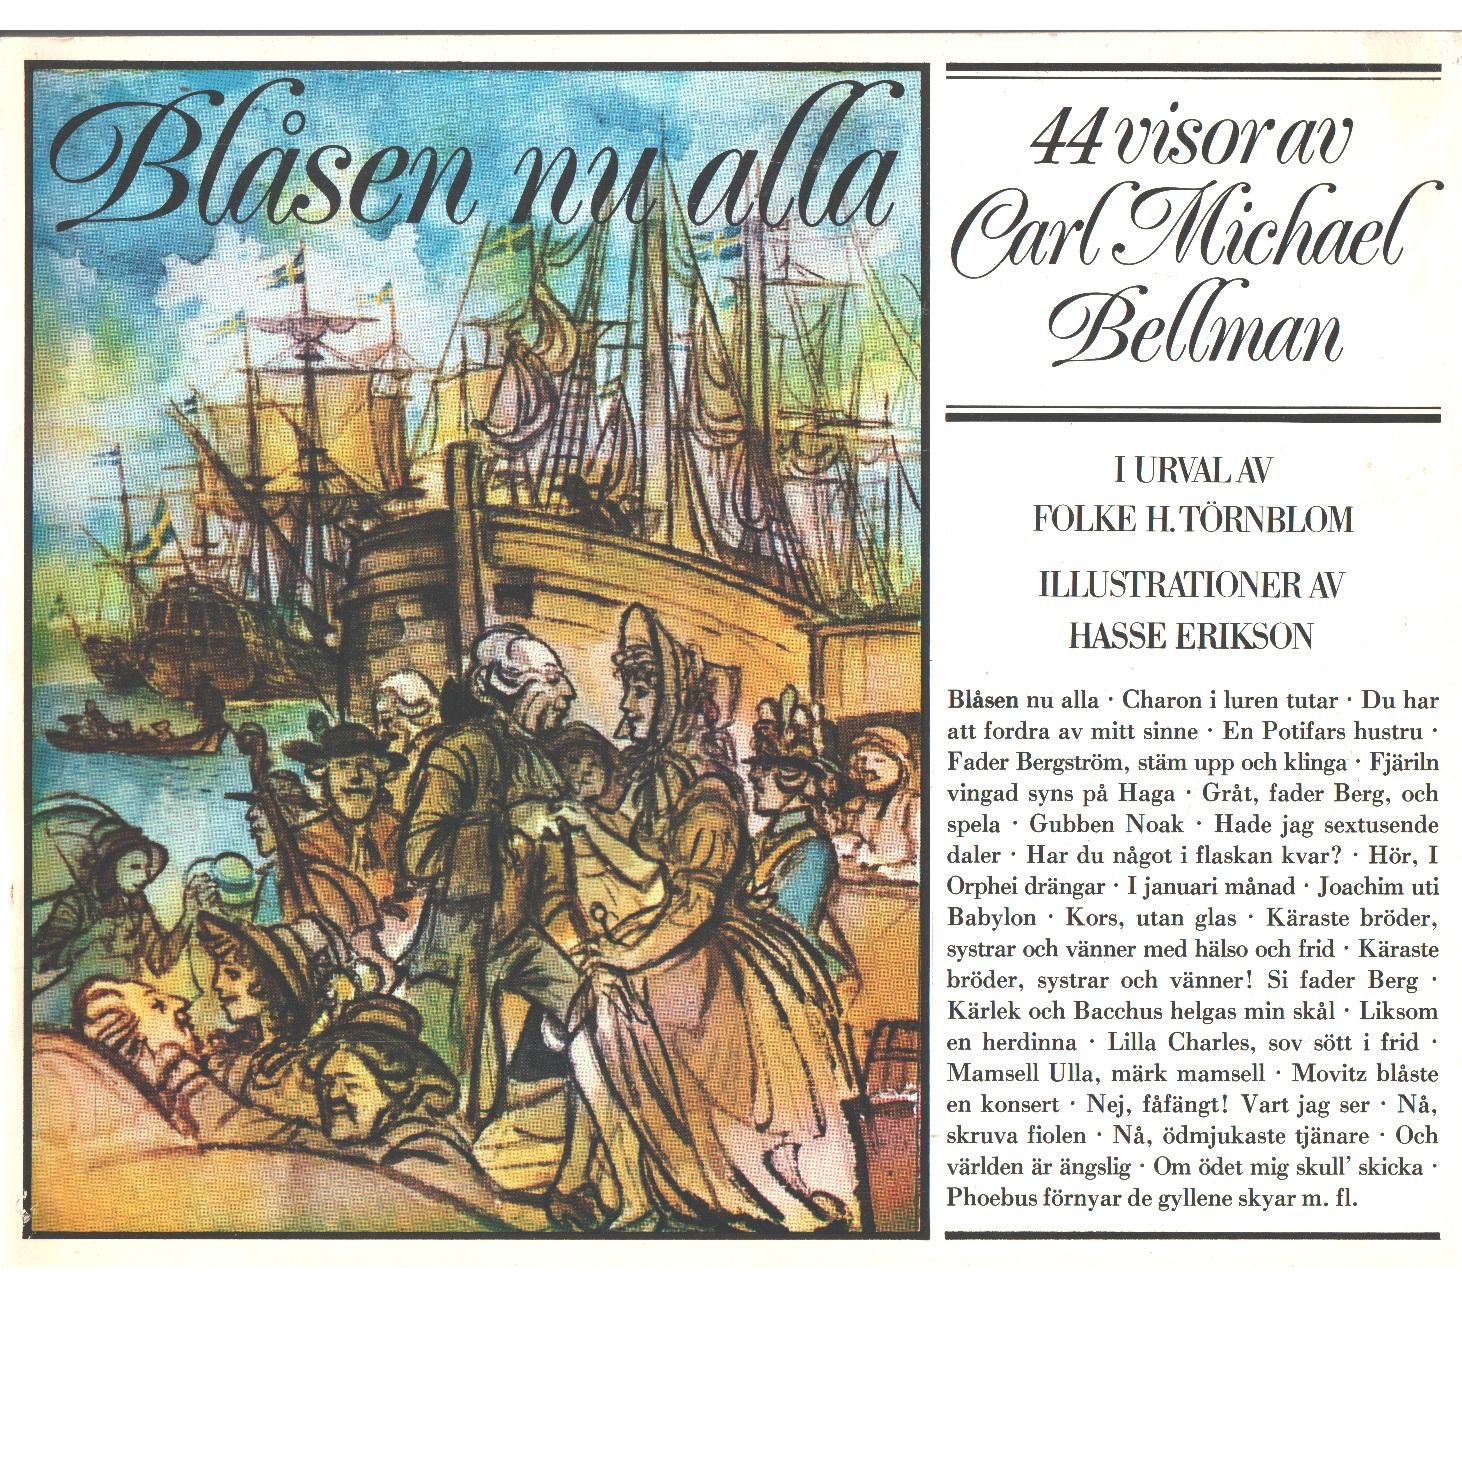 Blåsen nu alla : 44 visor - Bellman, Carl Michael